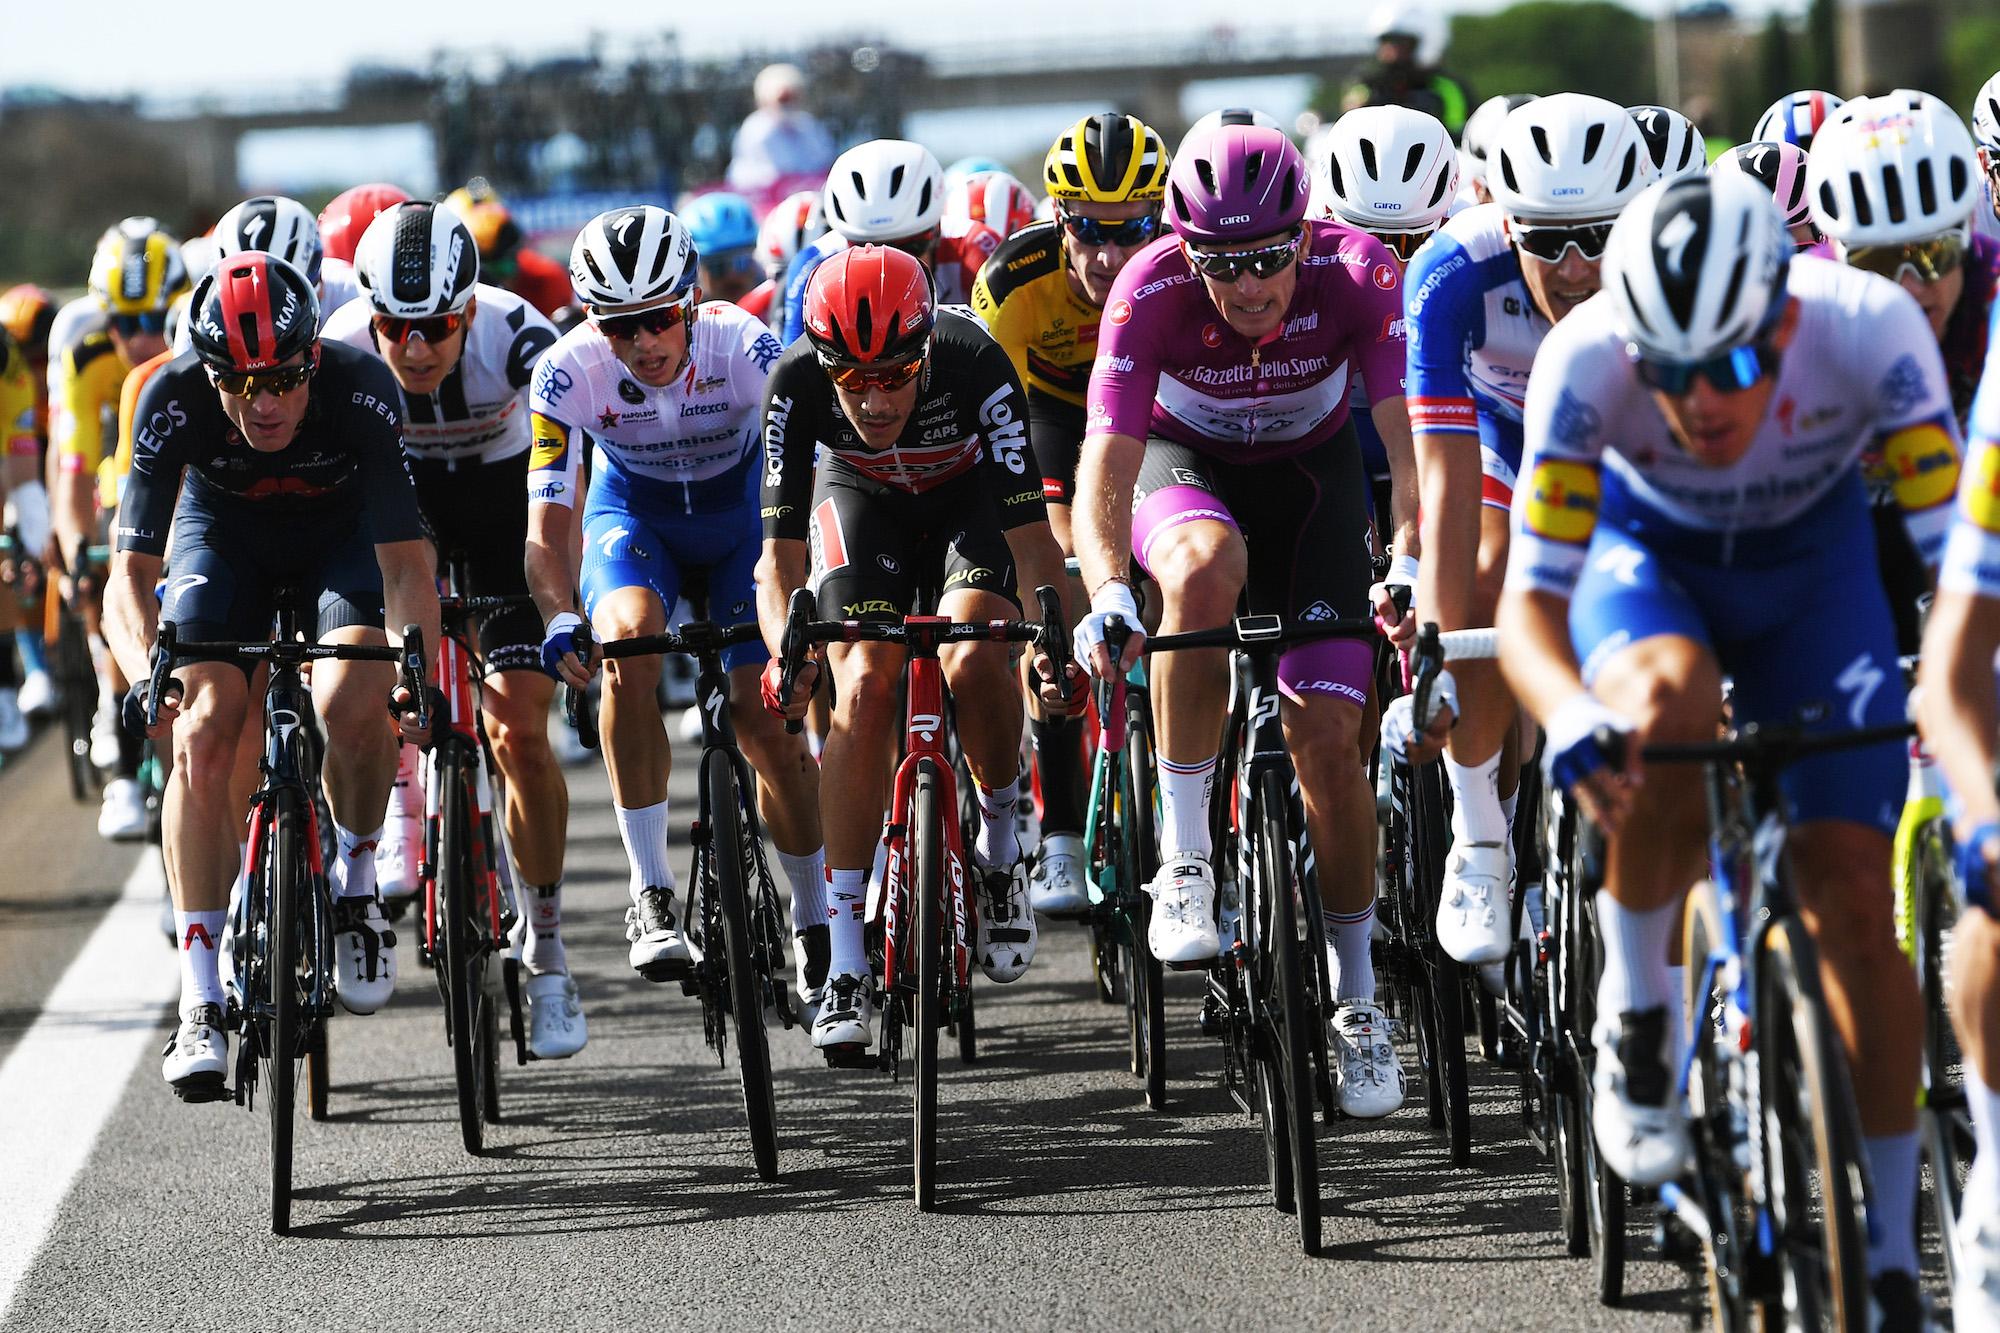 La séptima etapa rompe el récord de la etapa más rápida del Giro de Italia